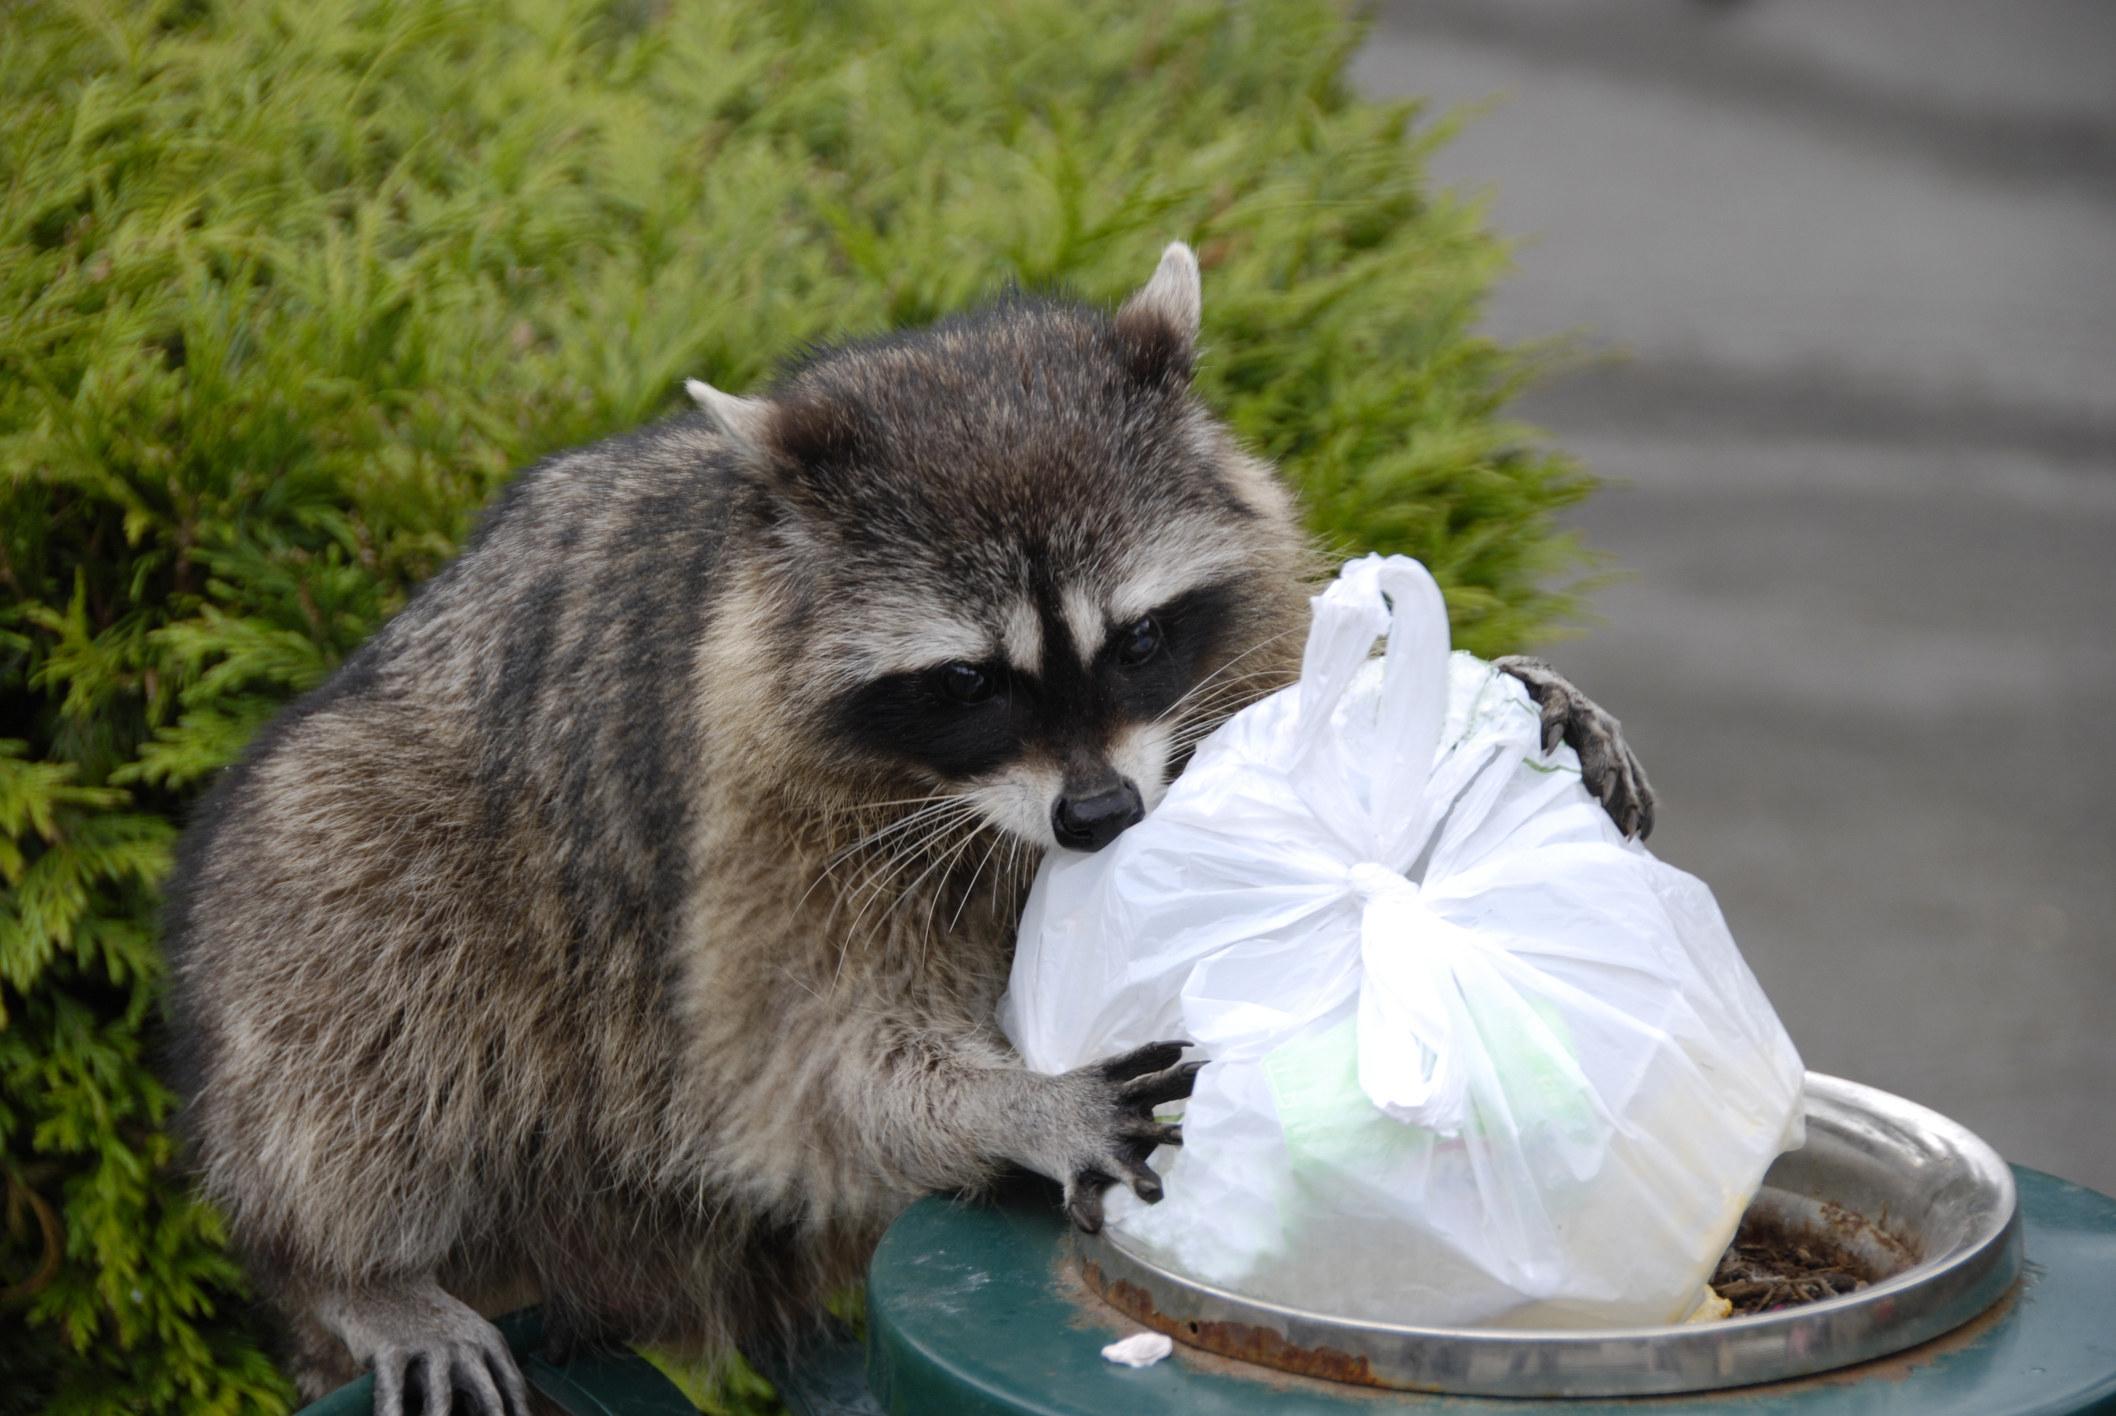 A racoon going through trash.